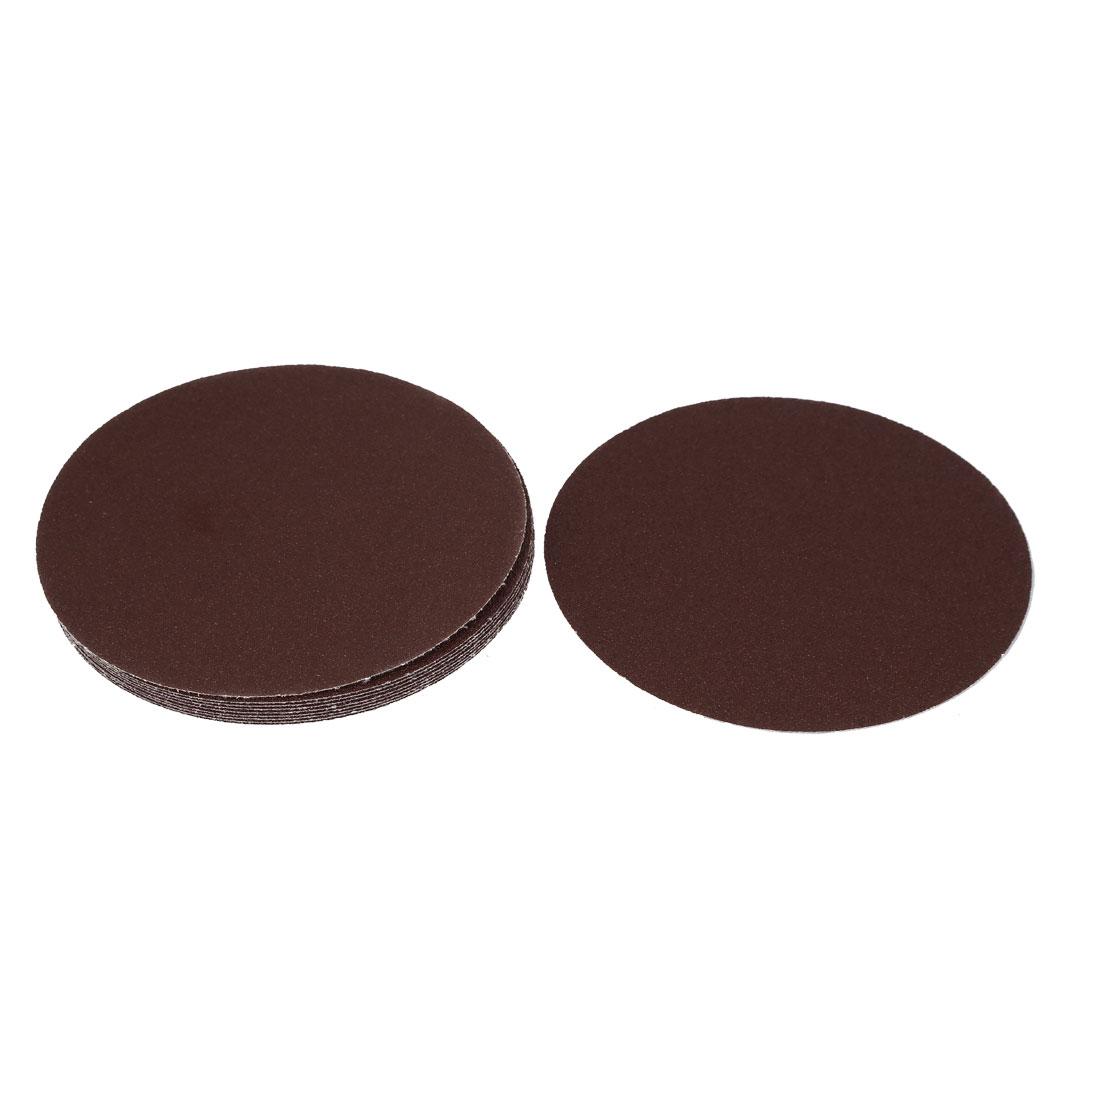 "7"" 60 Grit Abrasives Hook and Loop Sanding Paper Sheet Discs Dark Brown 10 Pcs"